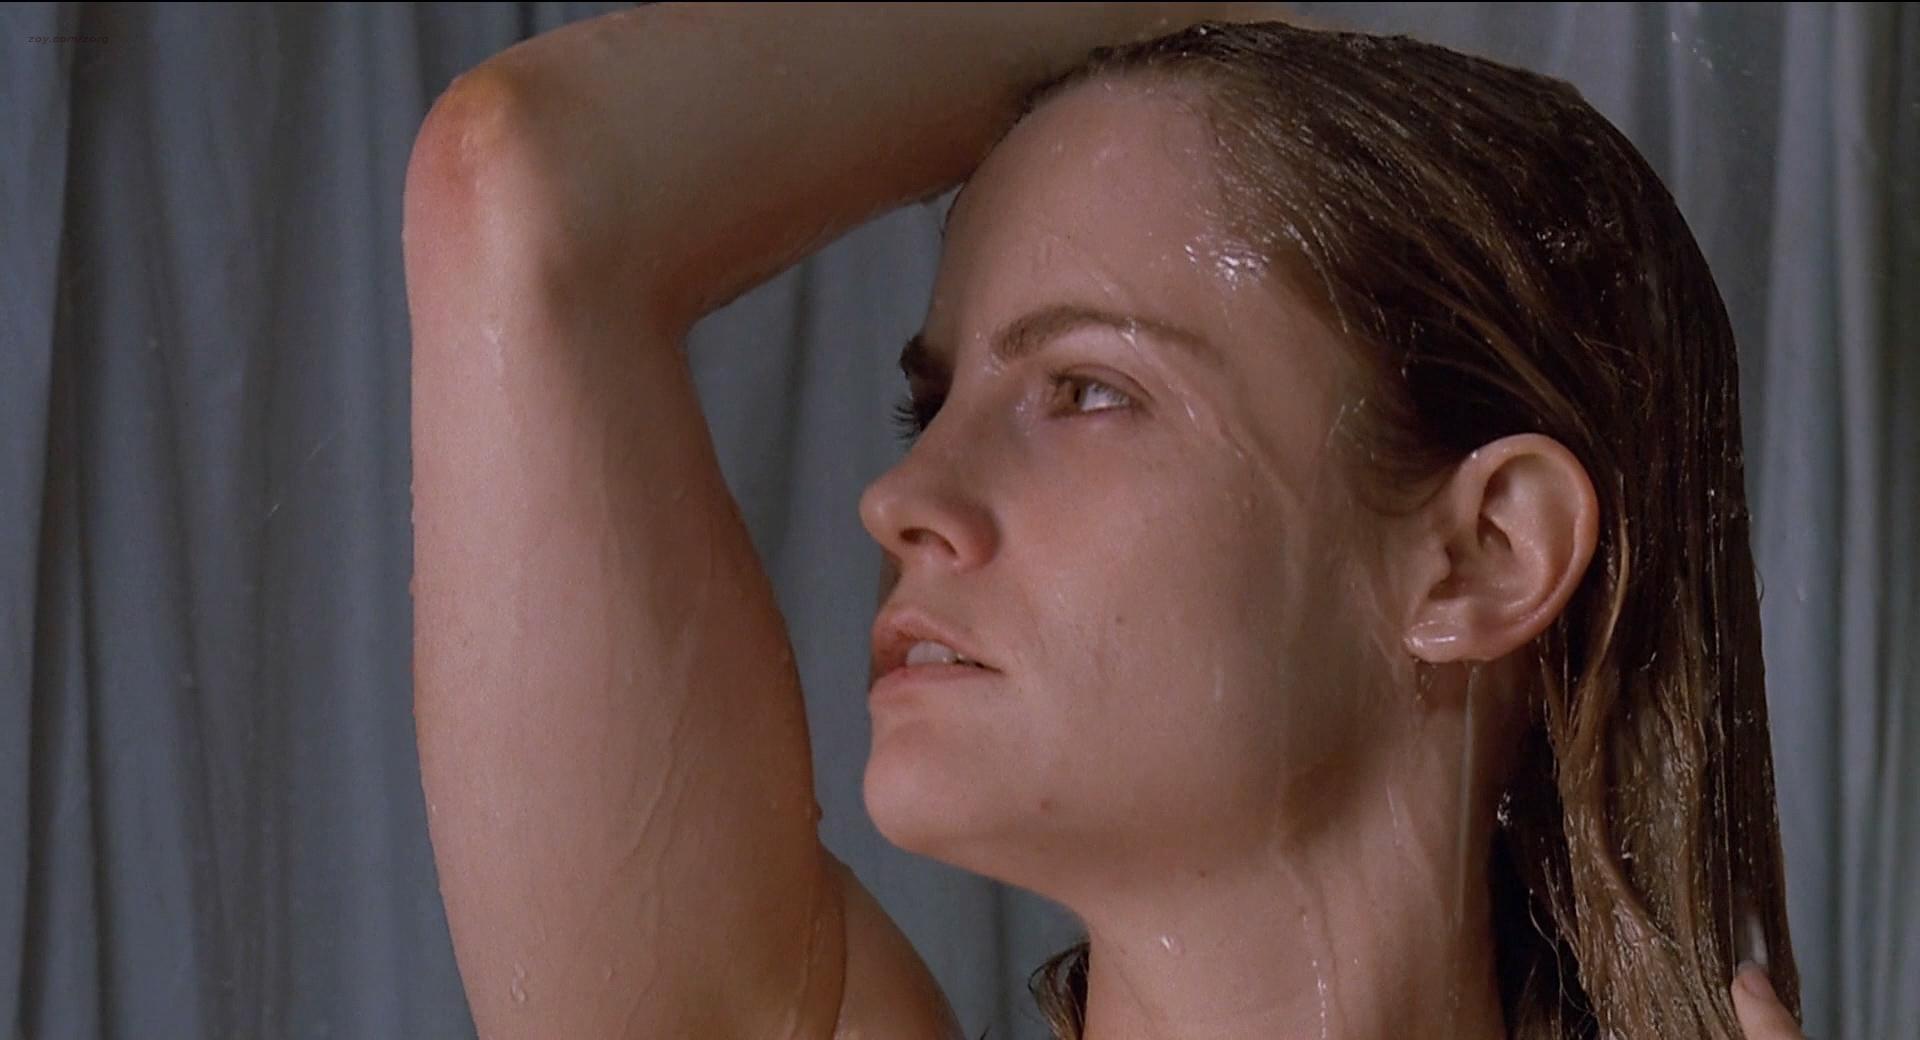 Diana zubiri naked scene